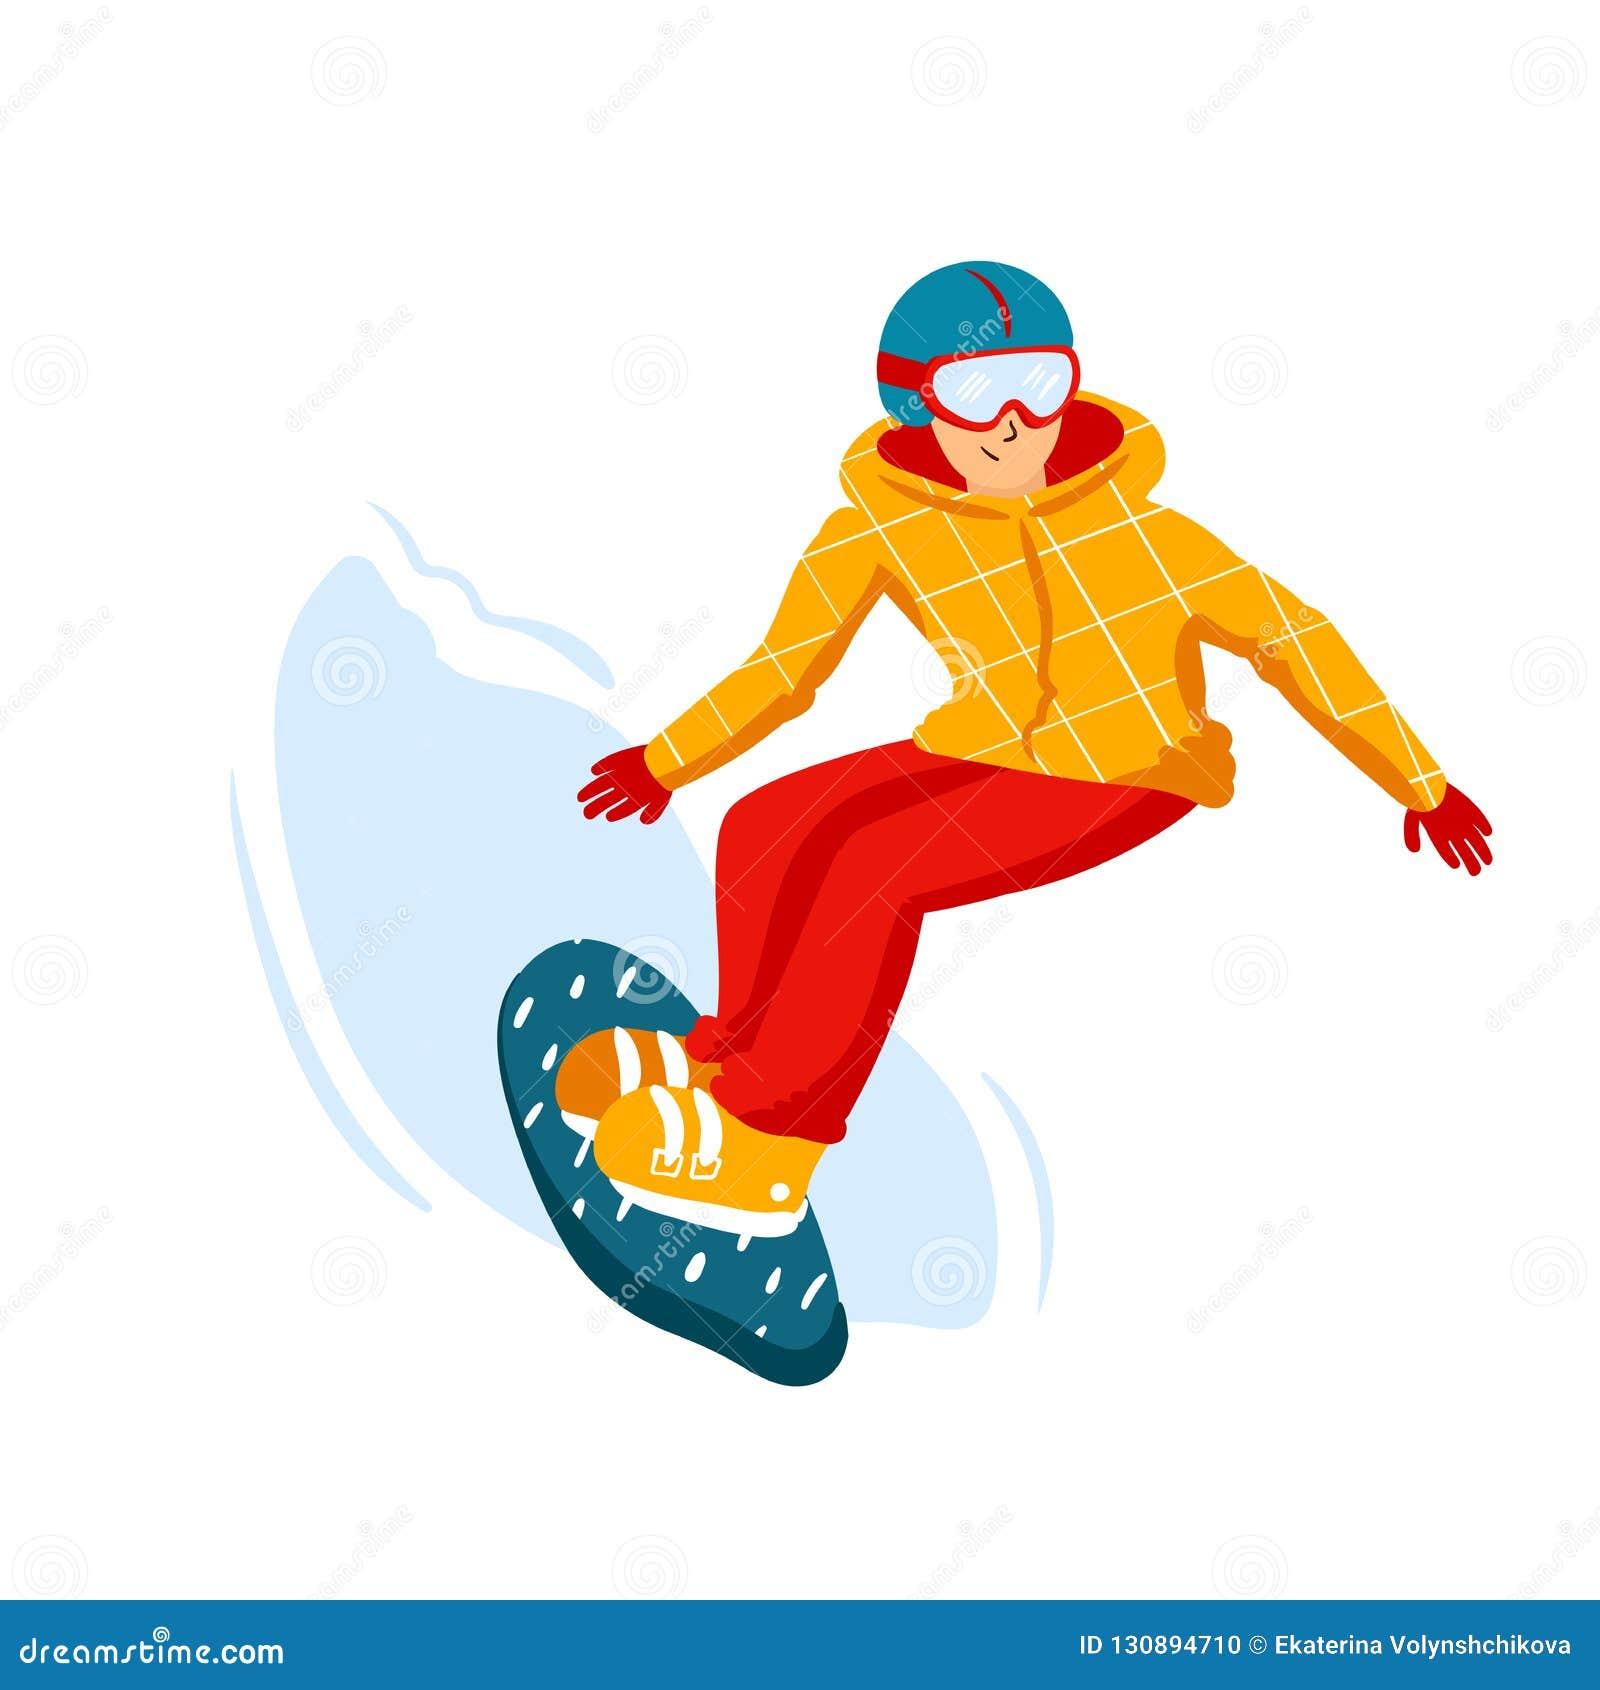 Cartoon Snowboard Riders Men Winter Mountain Sports Activity Ski Resort Vacation Vector Illustration In Simple Flat Stock Vector Illustration Of Rider Mountain 130894710